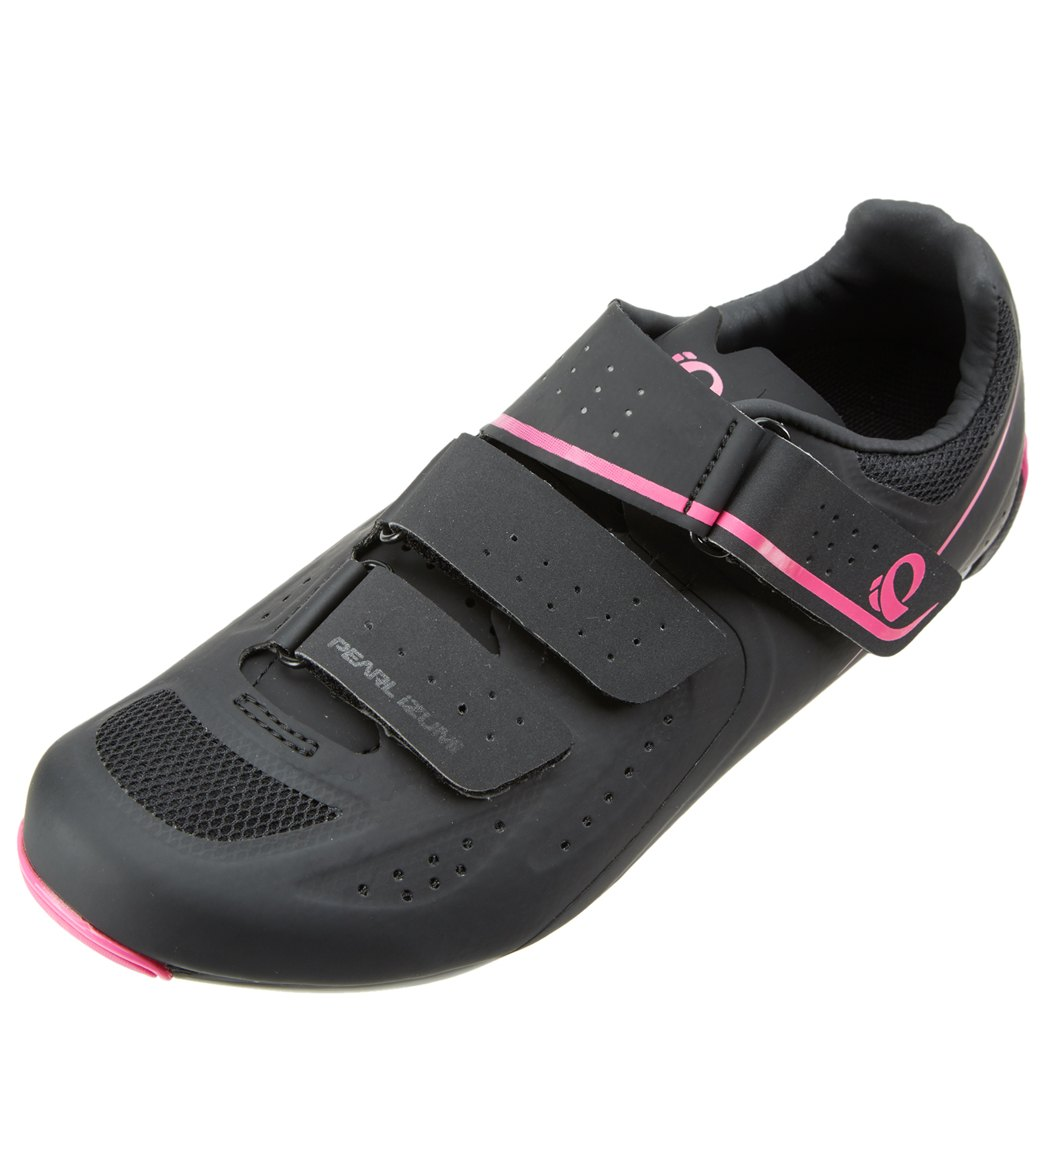 Pearl Izumi Women's Select Road V5 Studio Cycling Shoe - Black/Black 40 - Swimoutlet.com